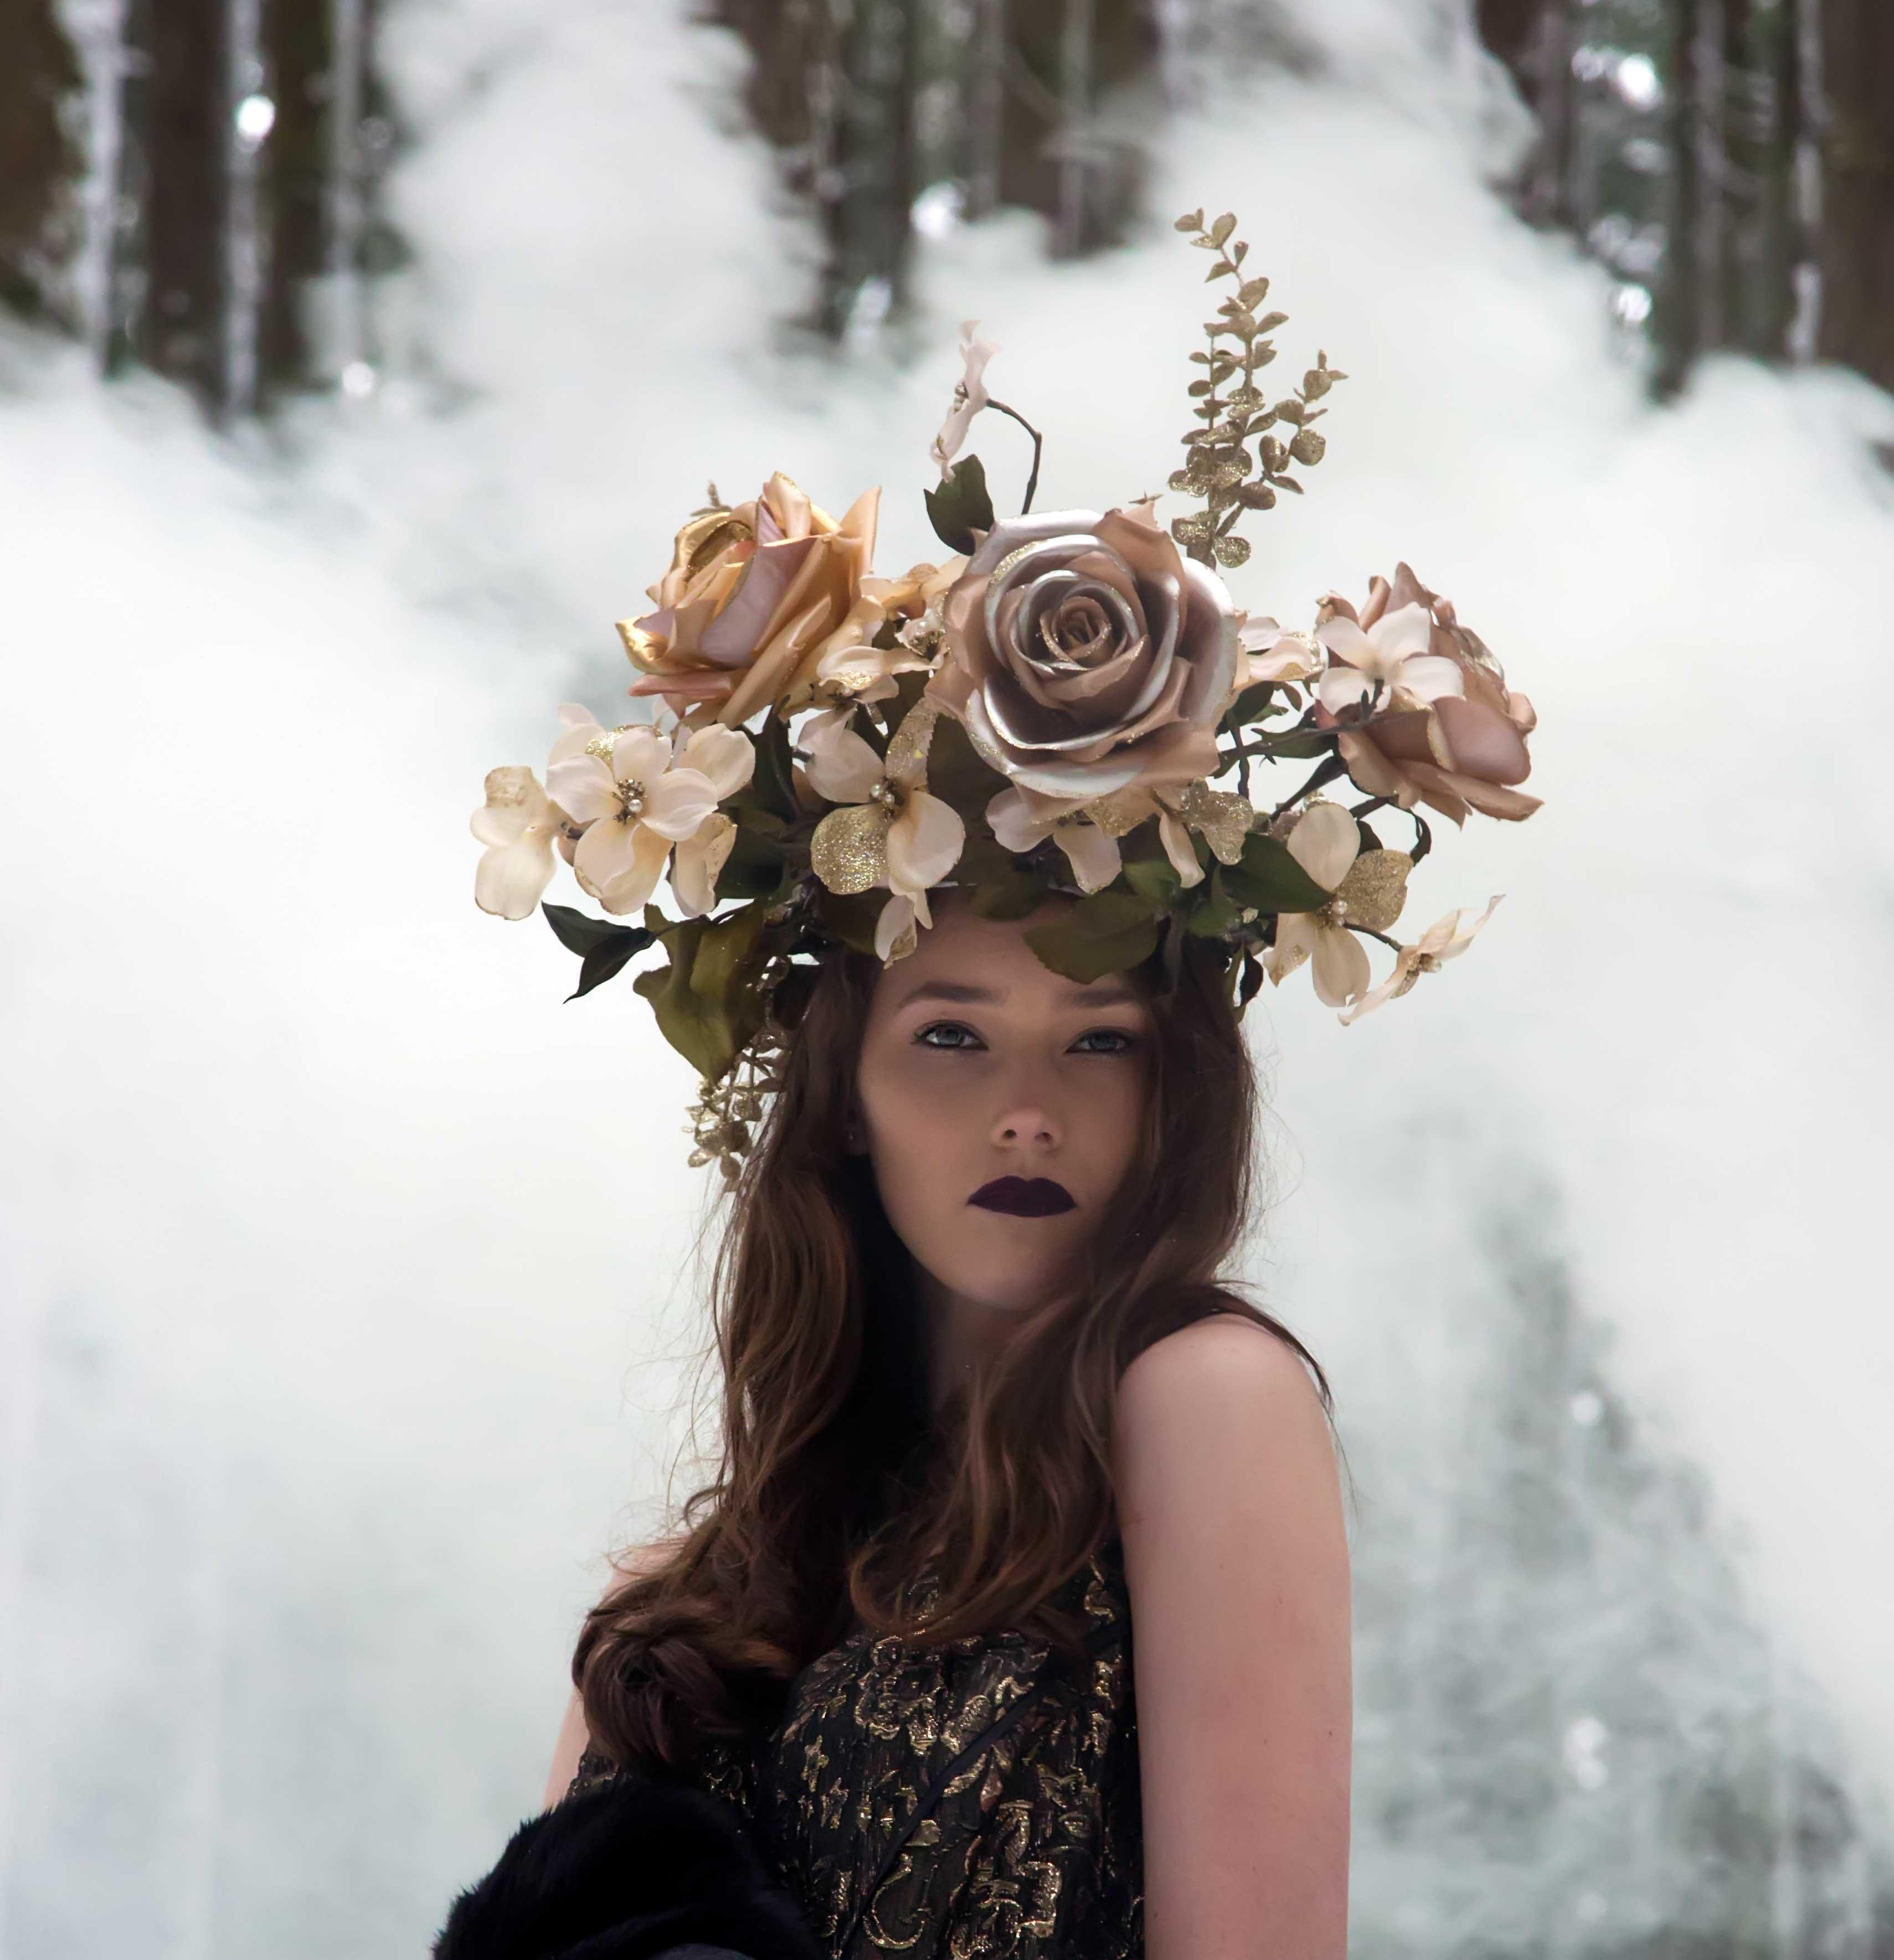 Fashion and Beauty Hair & MakeupPhoto credit: Hamid Shams